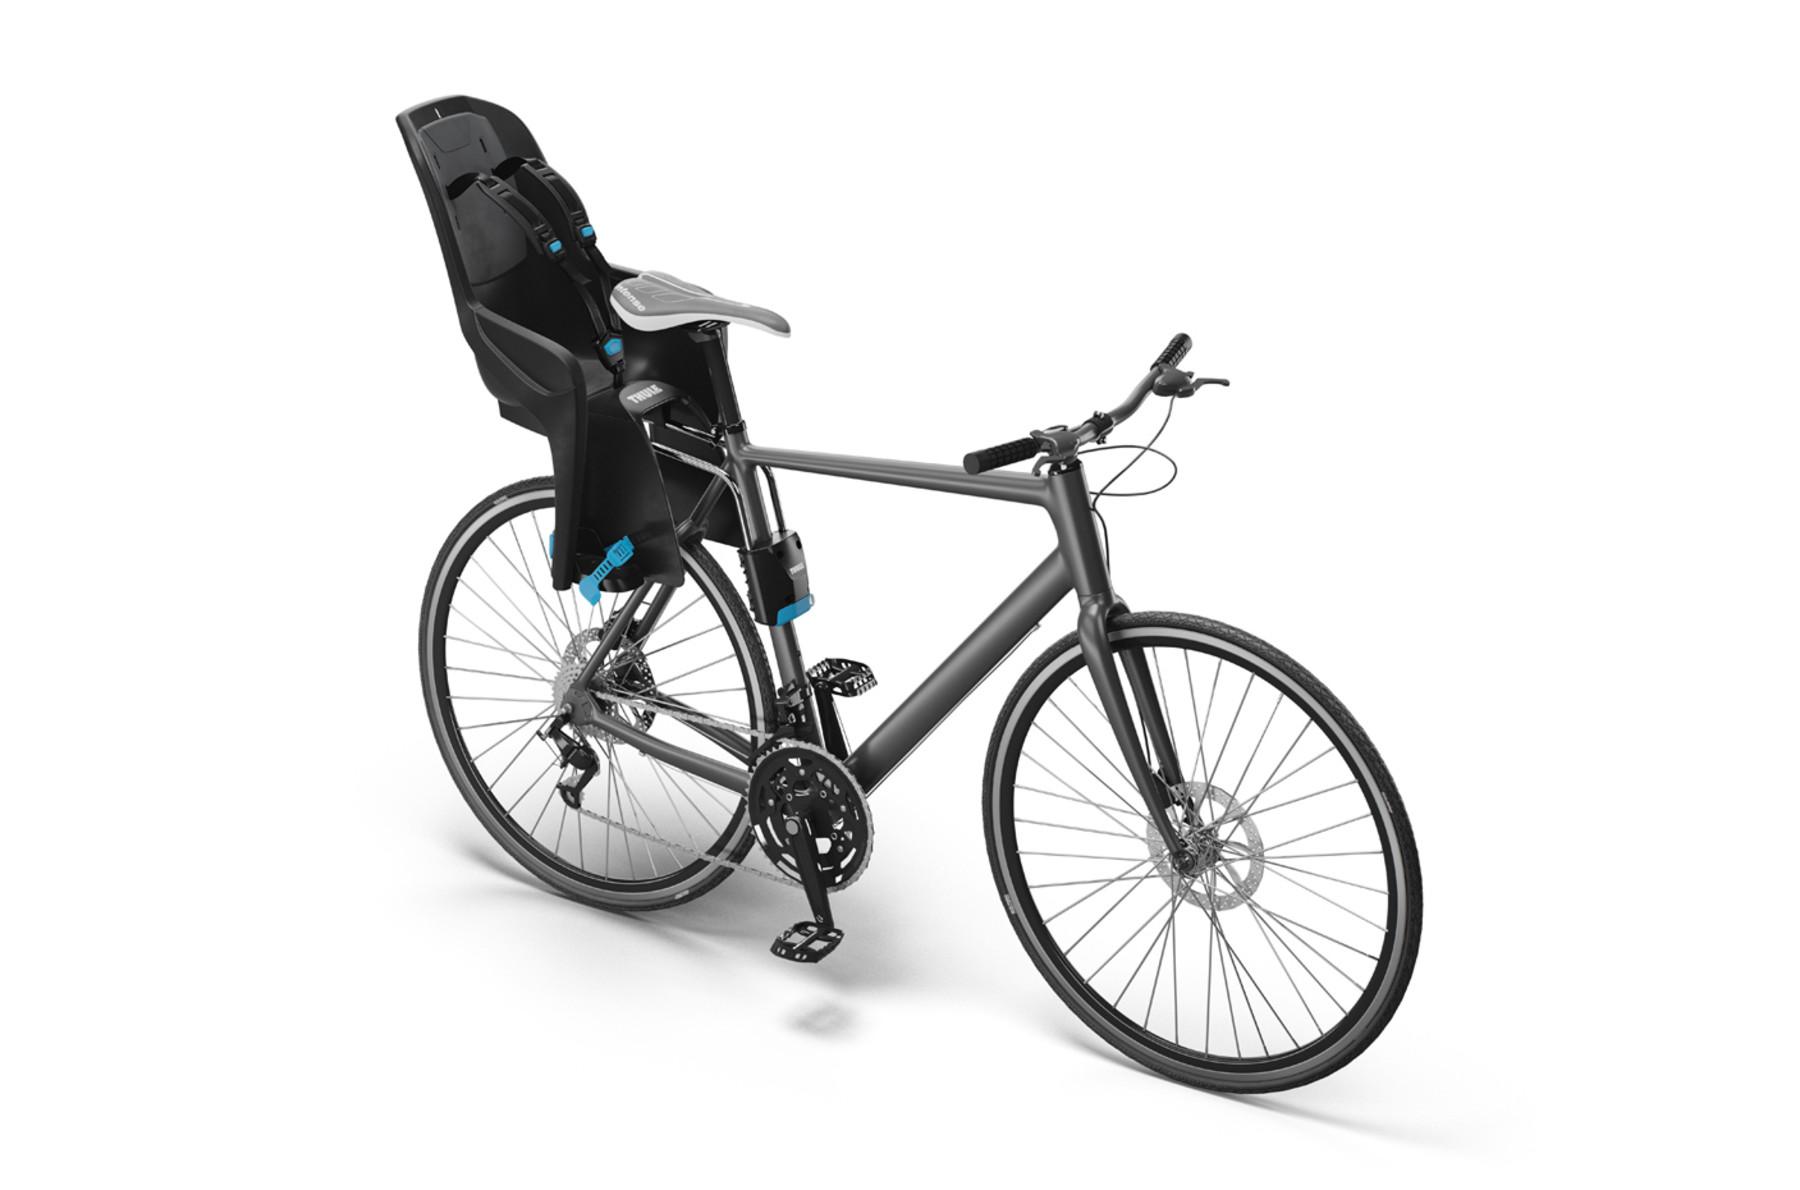 Cadeira Infantil p/ Bicicleta Thule RideAlong Lite